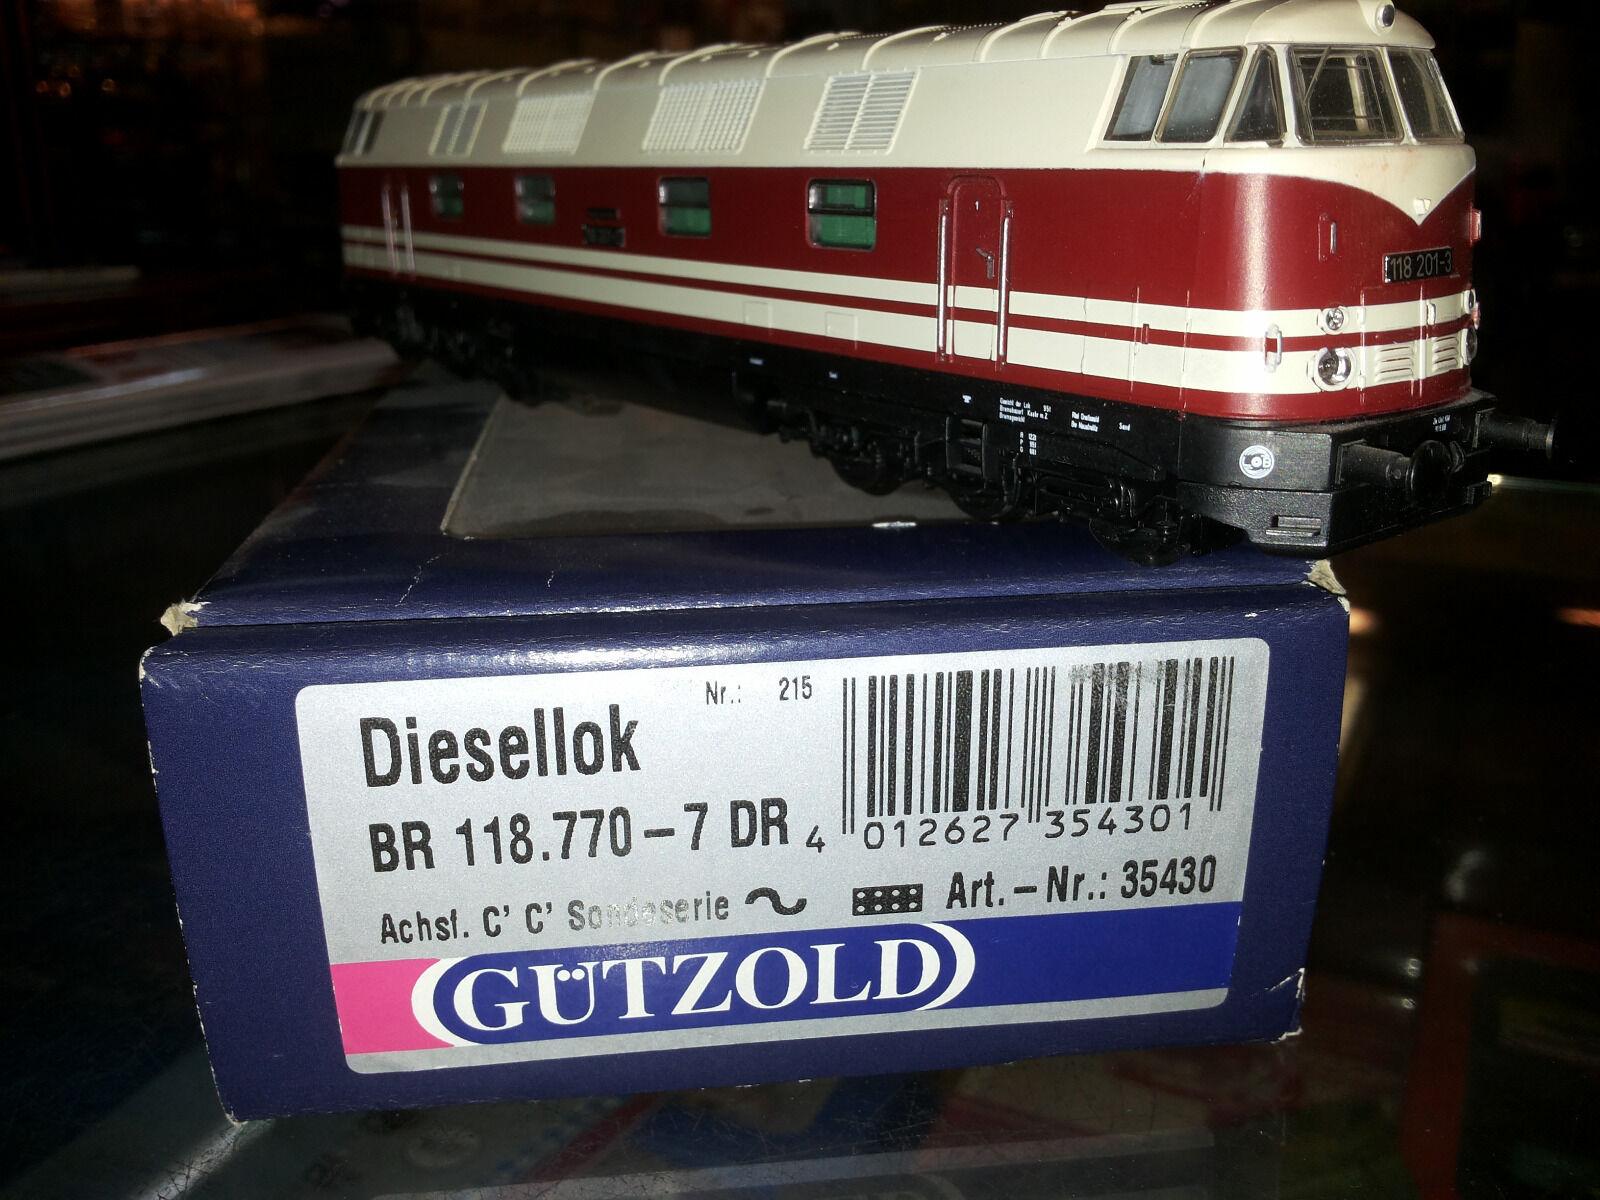 entrega rápida Gutzold 35430 35430 35430  per sistema Marklin analogica  comprar ahora